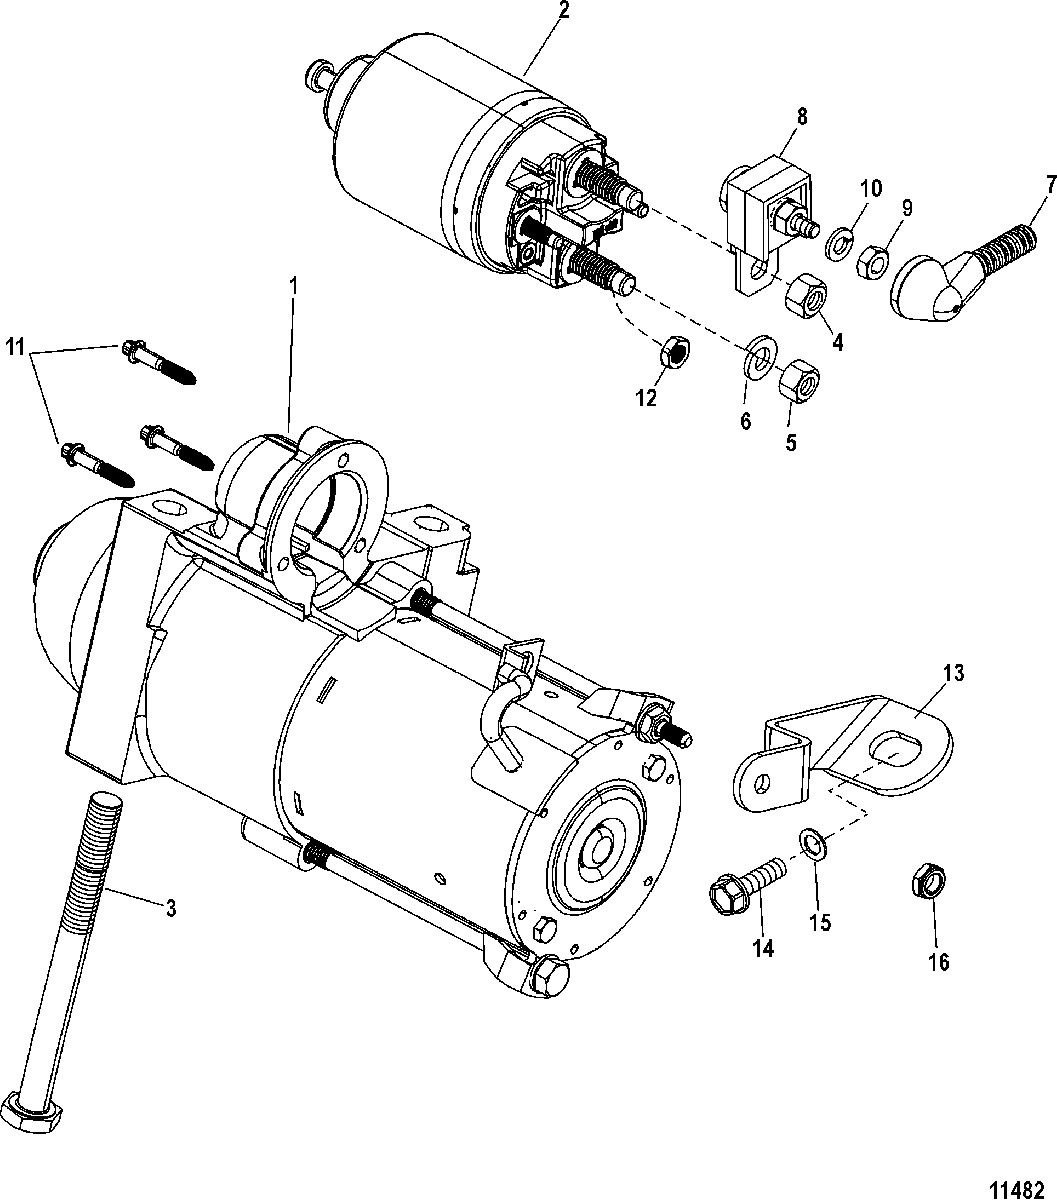 Crusader Engine Starter Wiring Diagram   Best Wiring Library - Mercruiser 3.0 Wiring Diagram